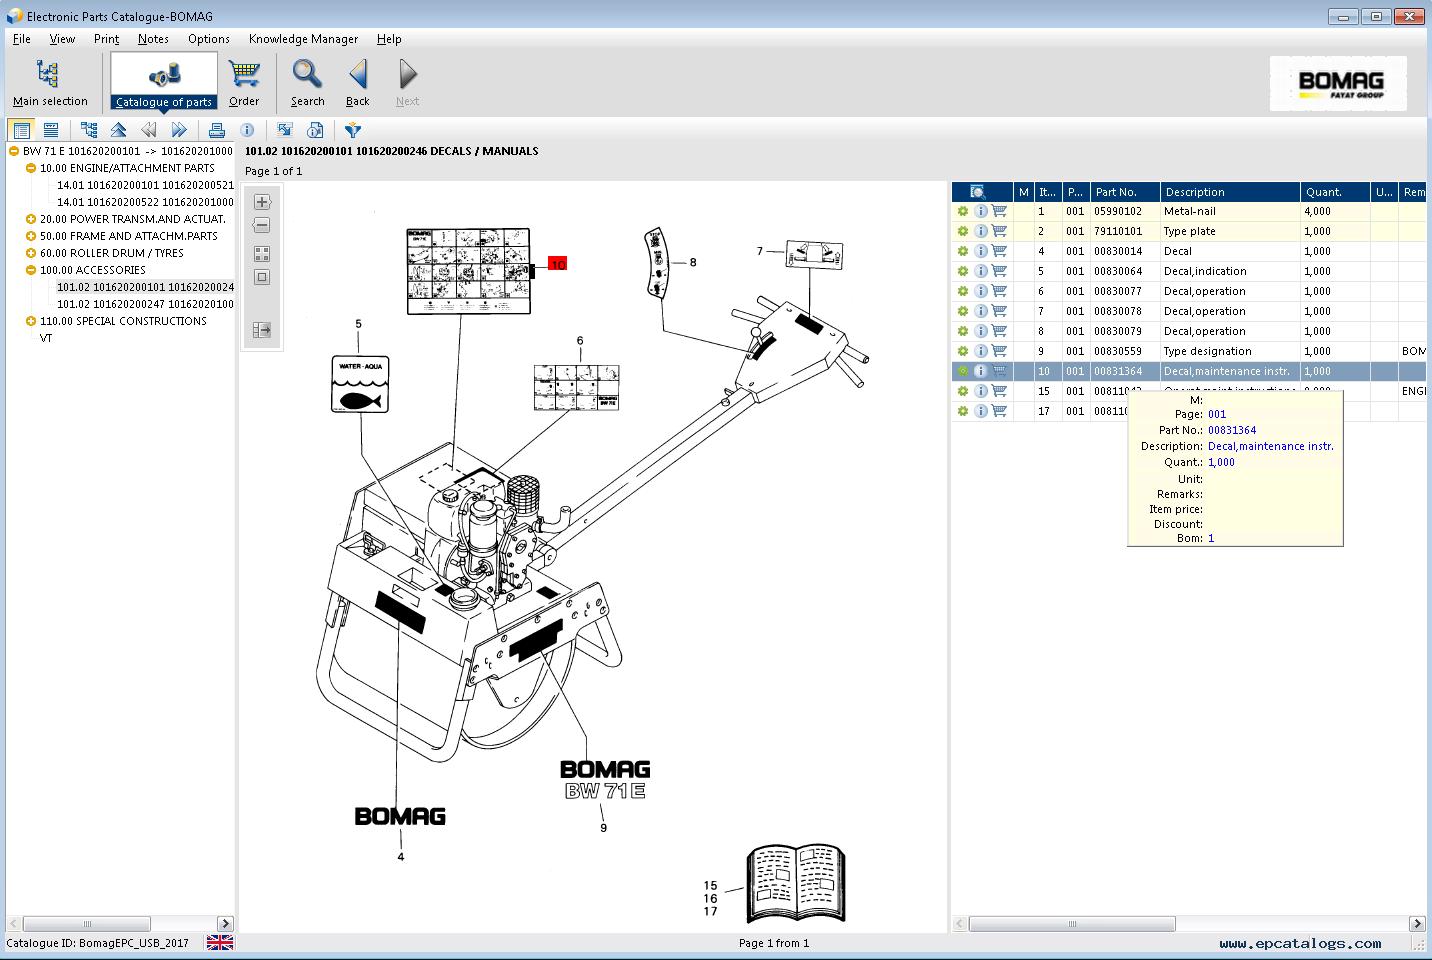 spare parts catalog BOMAG Electronic Parts Catalogue 07/2017 - 6